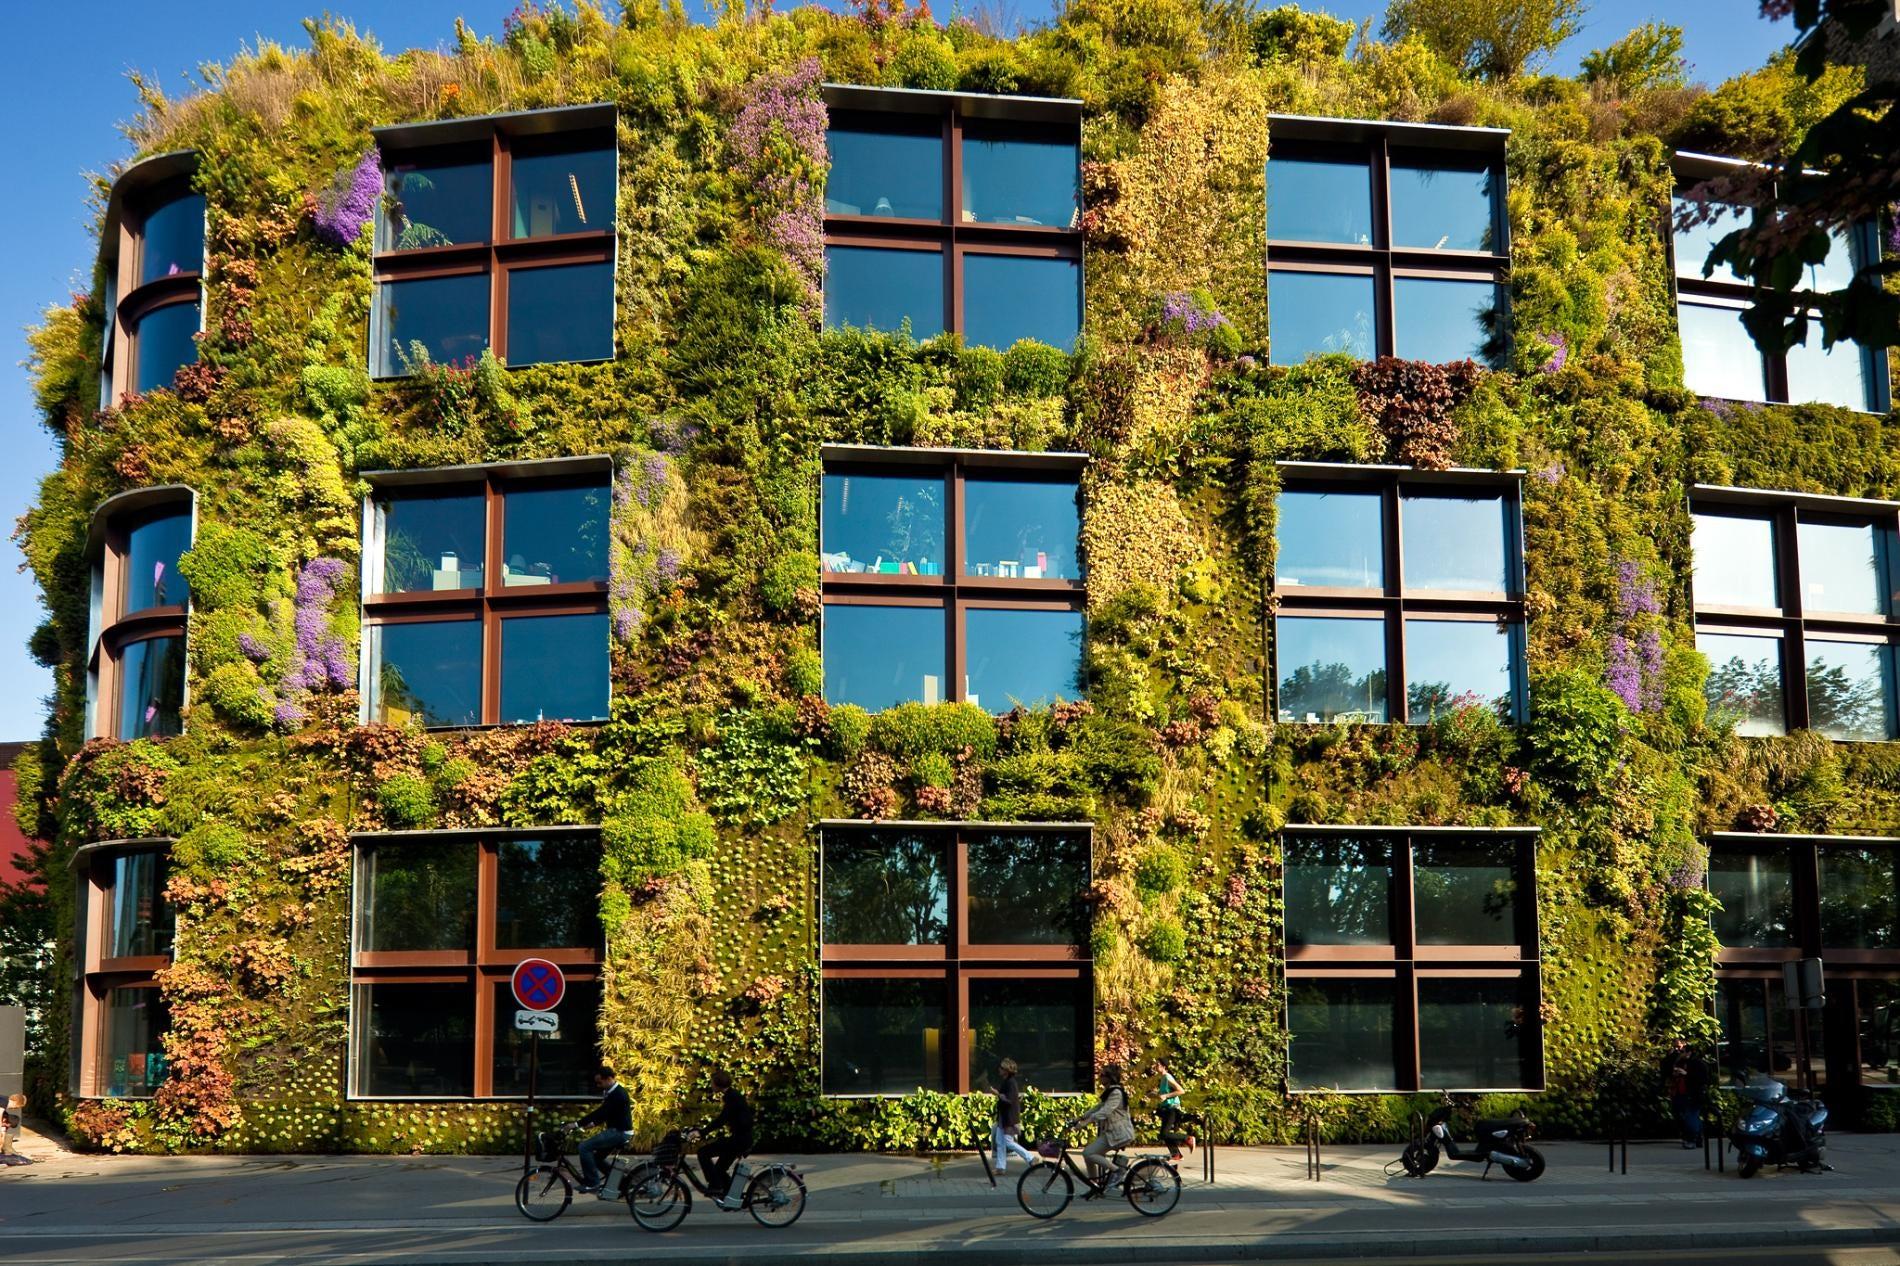 It's Alive! 5 Huge, Lushly-Planted Living Façades